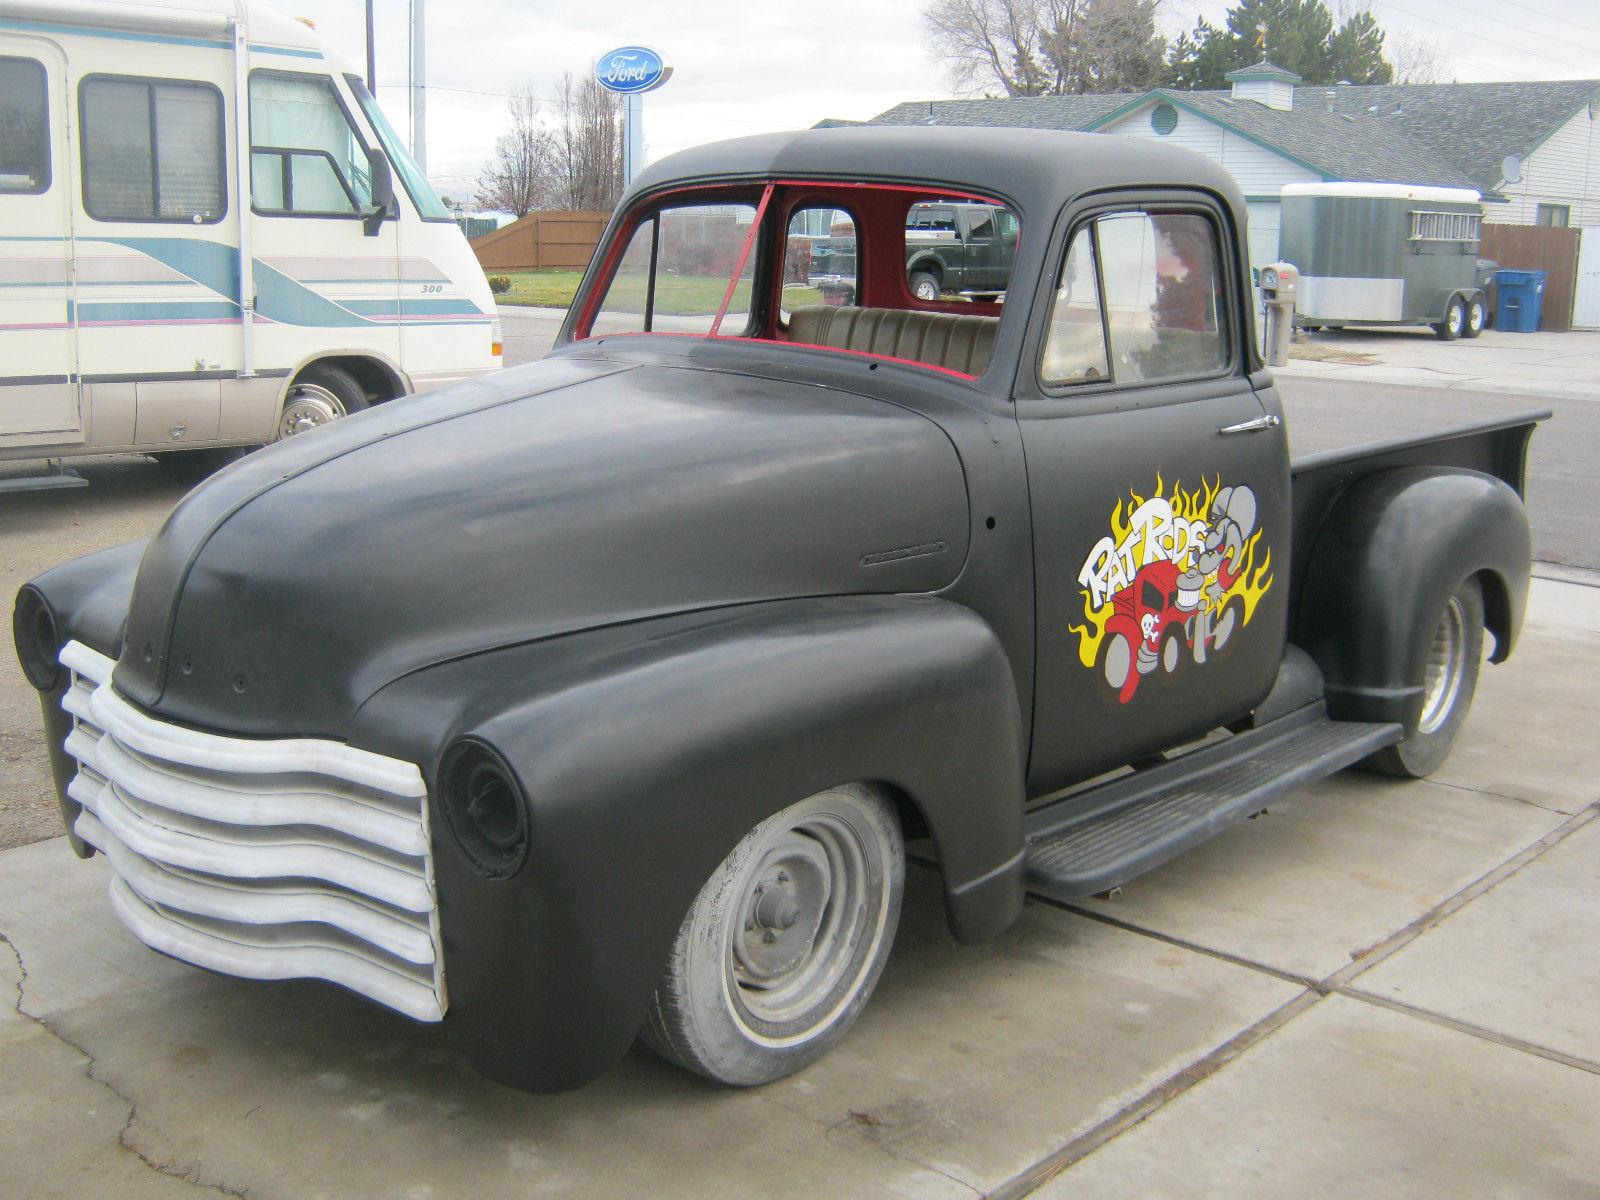 1952 Chevy Short Bed Pick Up Truck Custom Build Rat Rod Hot 1951 Chevrolet